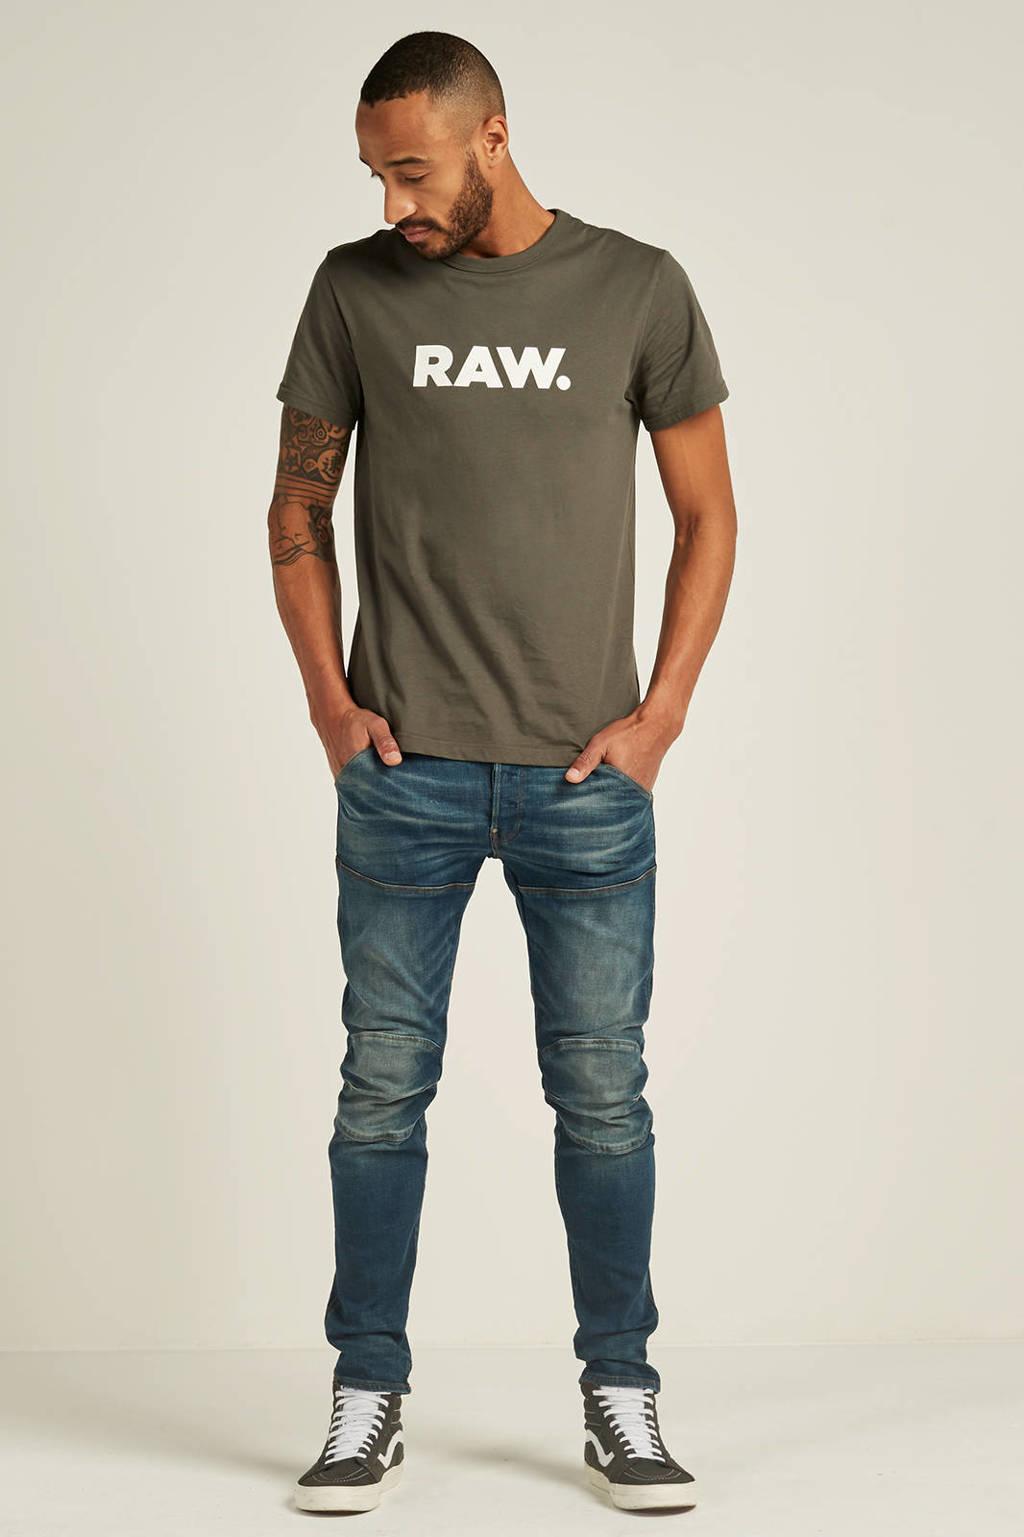 G-Star RAW Holorn T-shirt, Donkergroen/wit